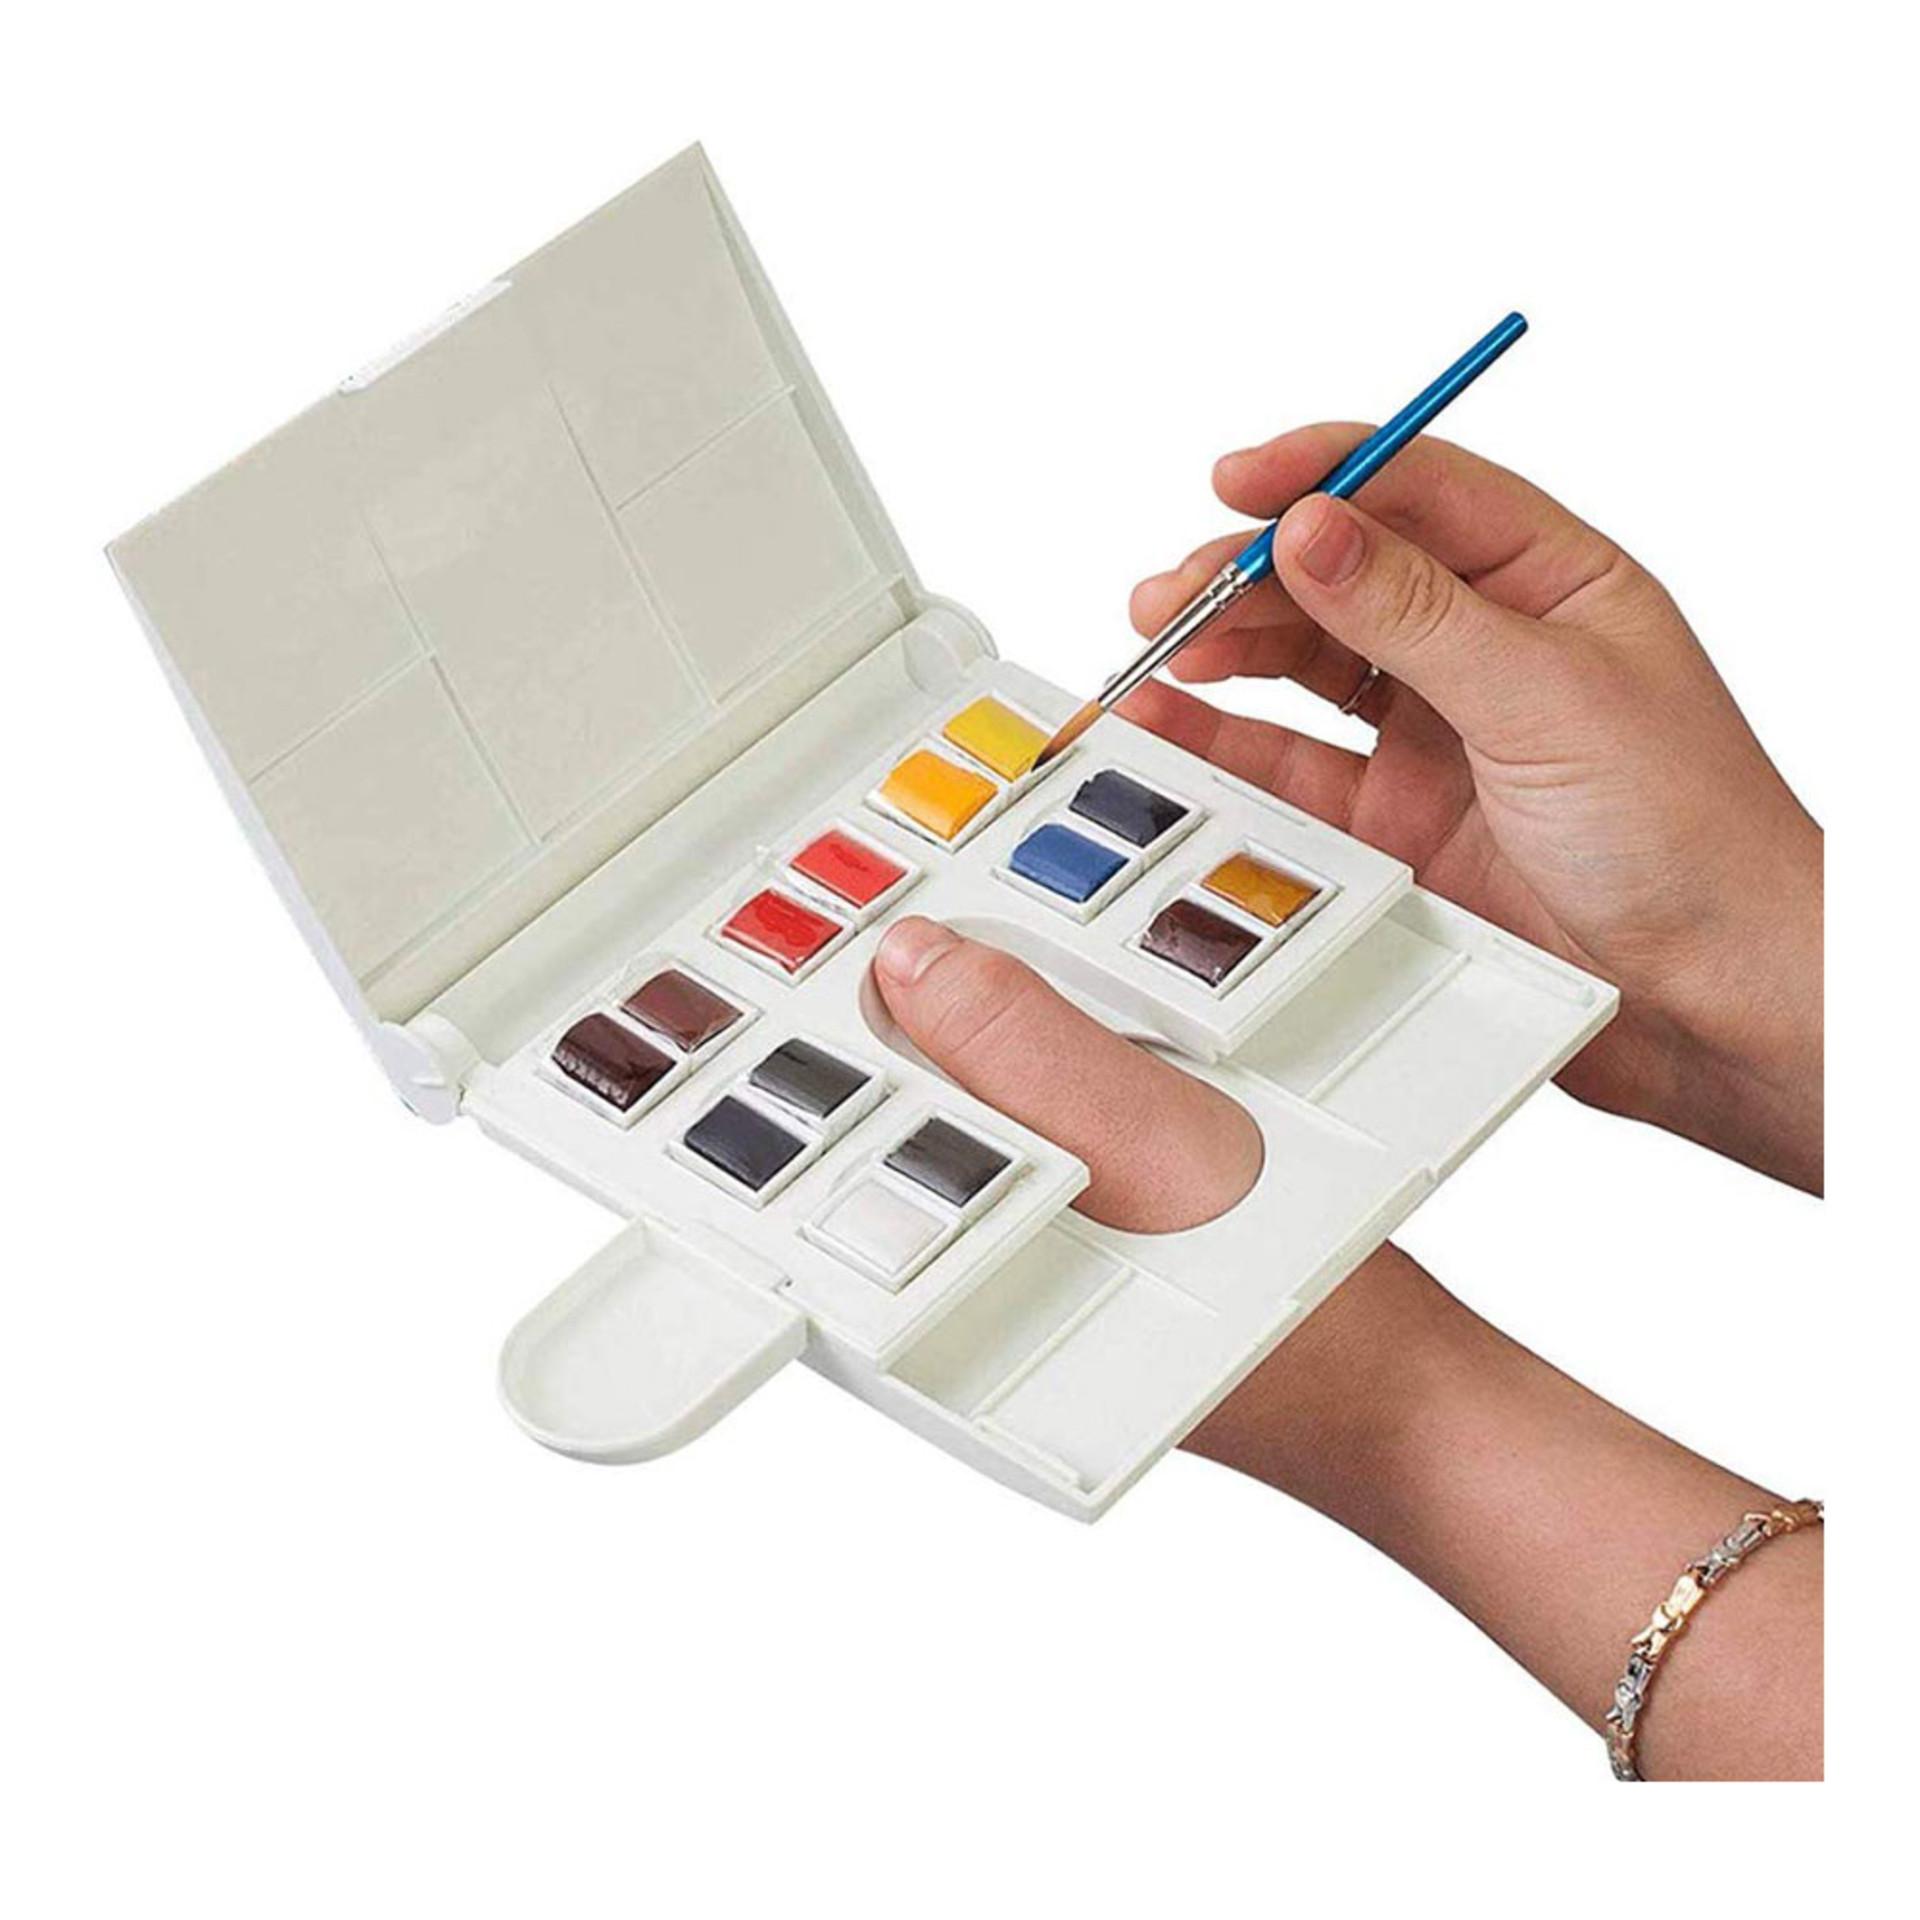 Winsor & Newton Compact Watercolor Mixing Tray